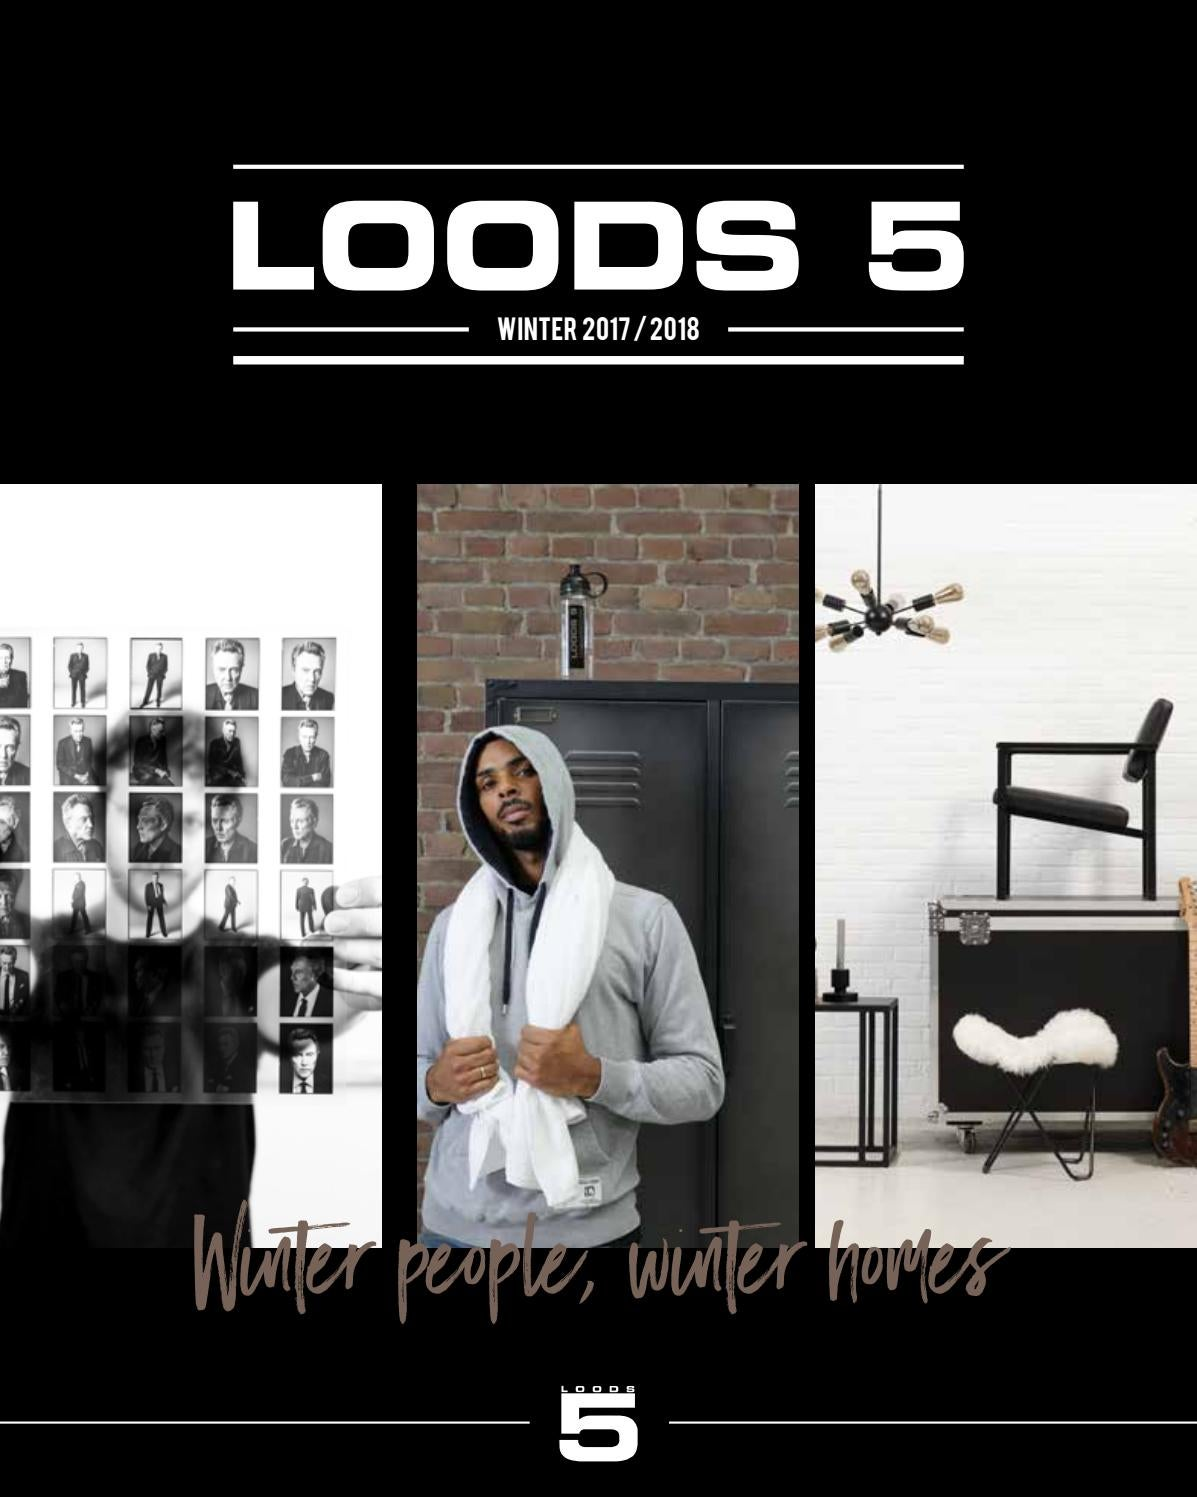 Loods 5 Wintermagazine 20172018 By Ontwerpstudio 5 Issuu